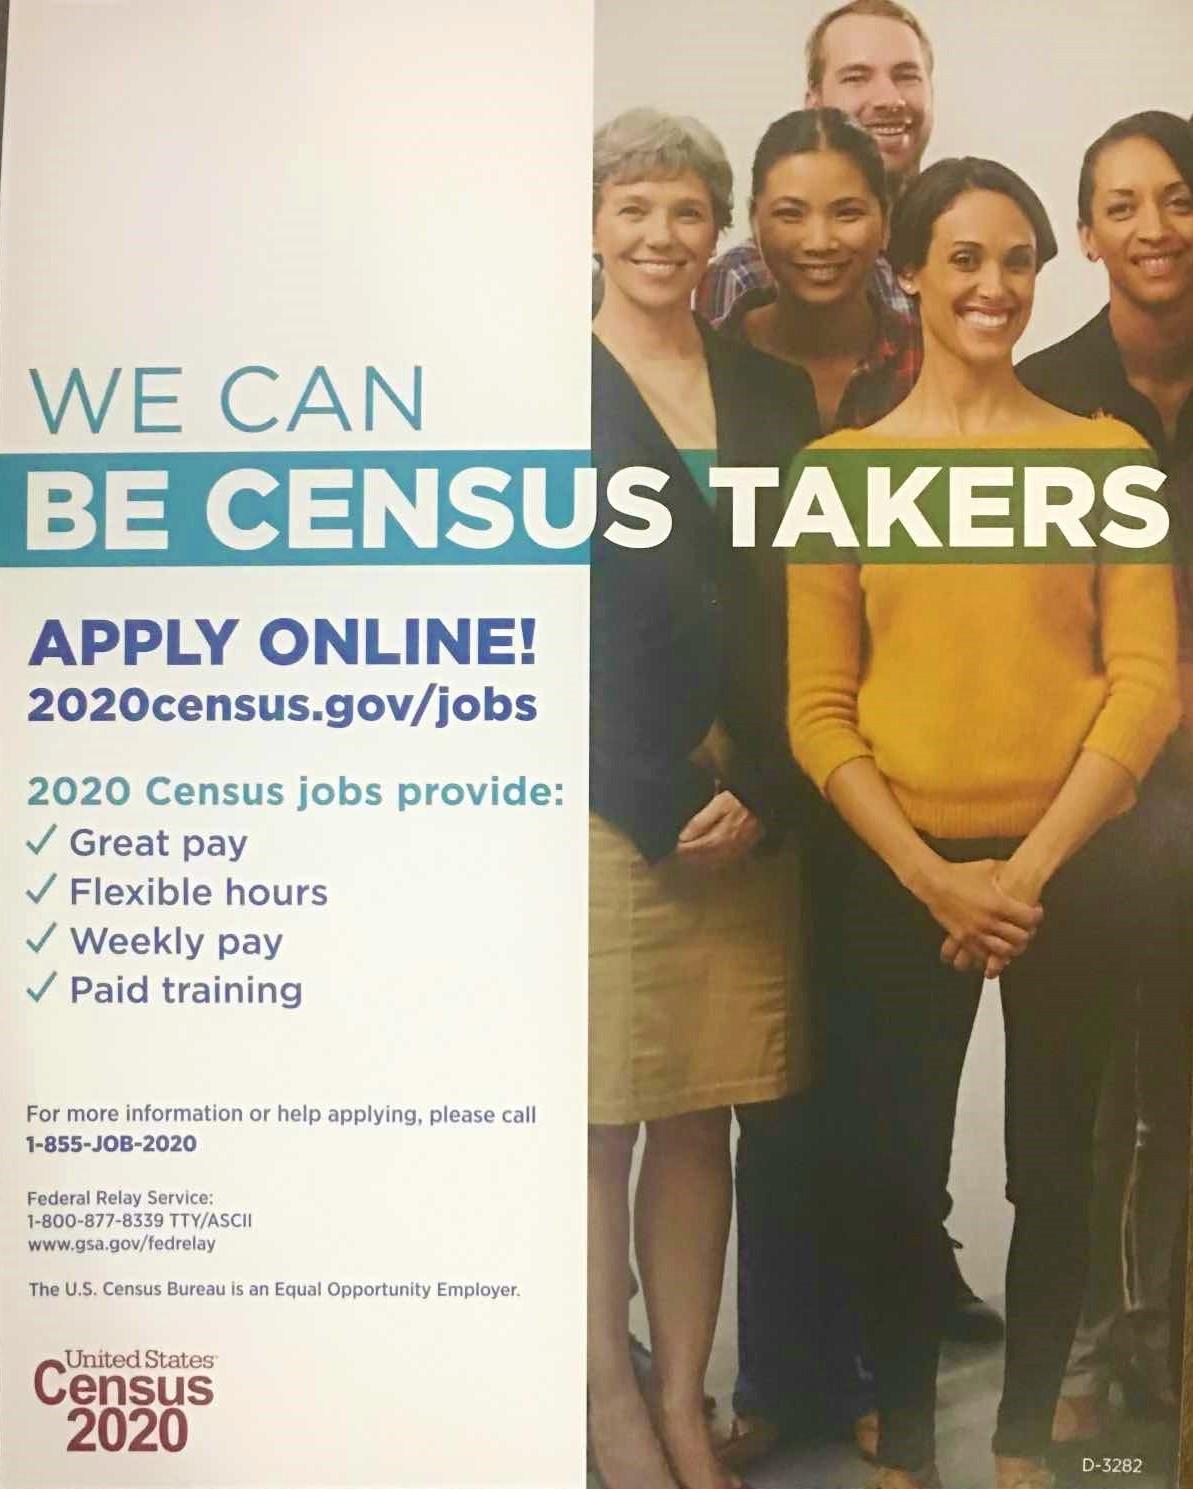 census taker job.jpg